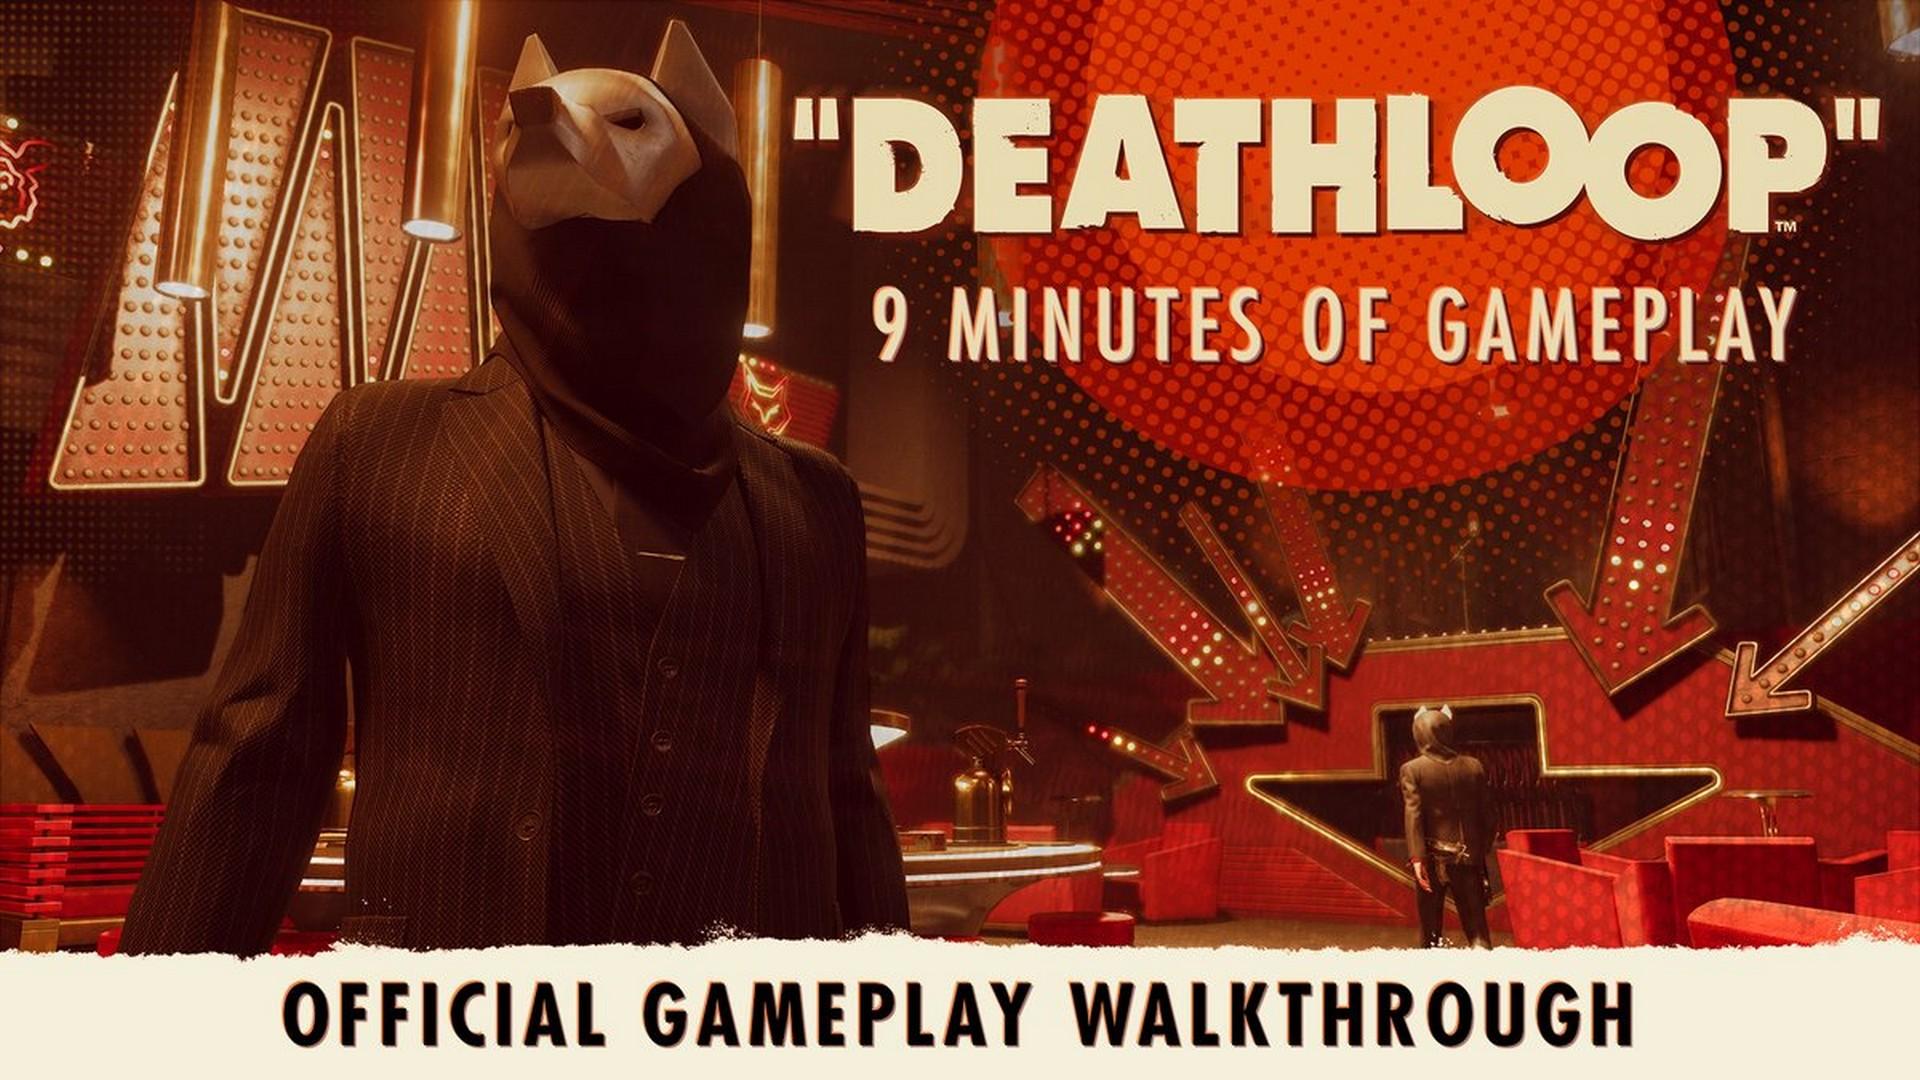 New DEATHLOOP Gameplay Walkthrough Revealed At Sony State of Play